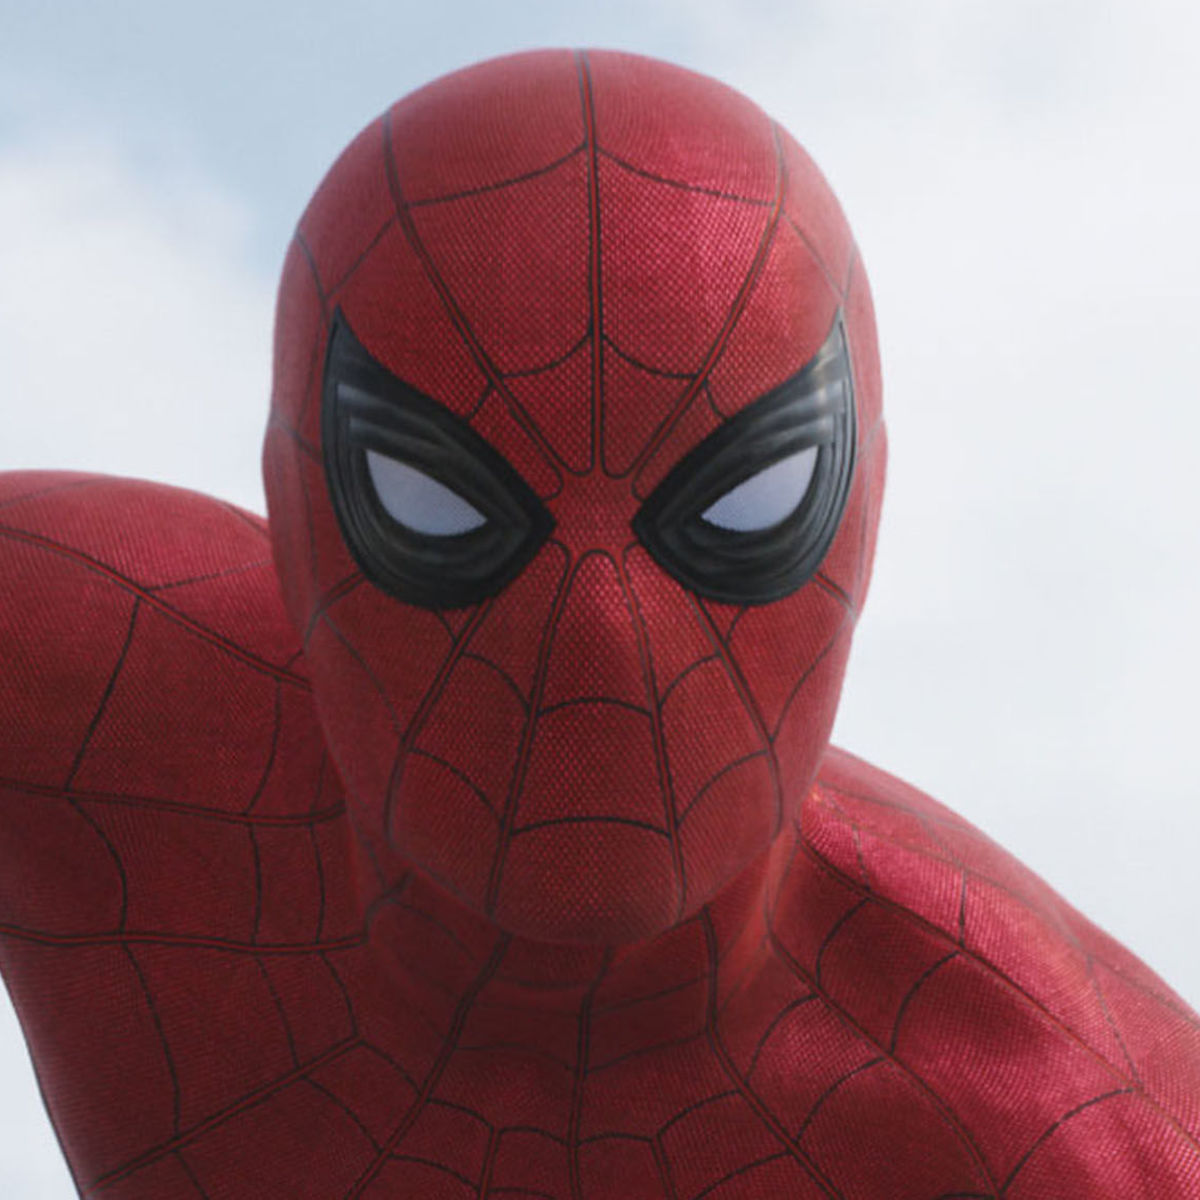 Spider-Man Civil War mask close up